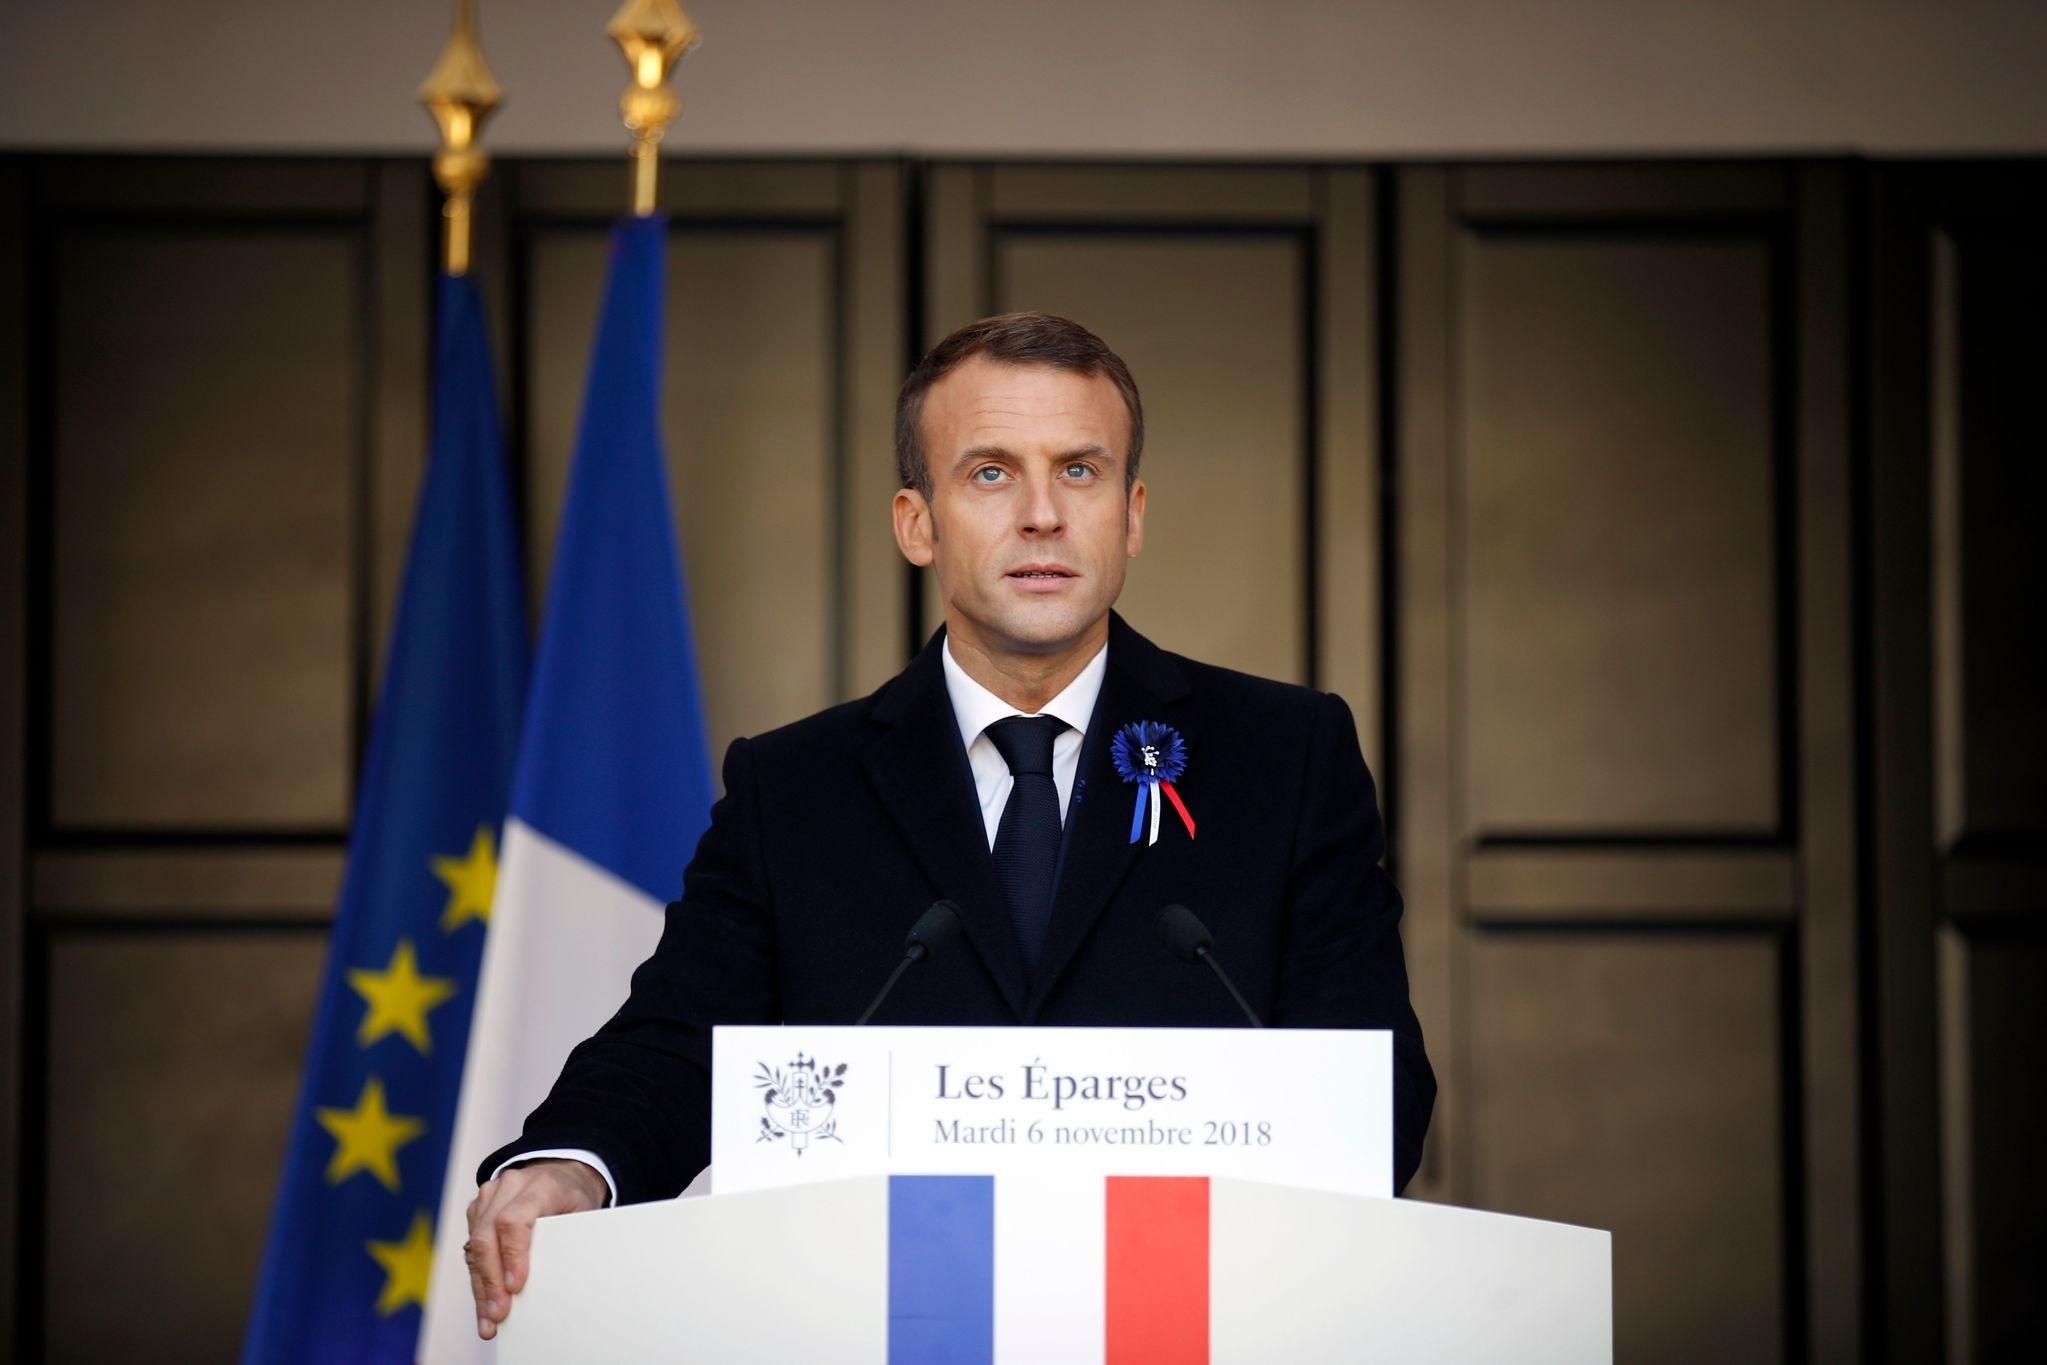 French president Emmanuel Macron delivers a speech, Les Eparges, Nov. 6.